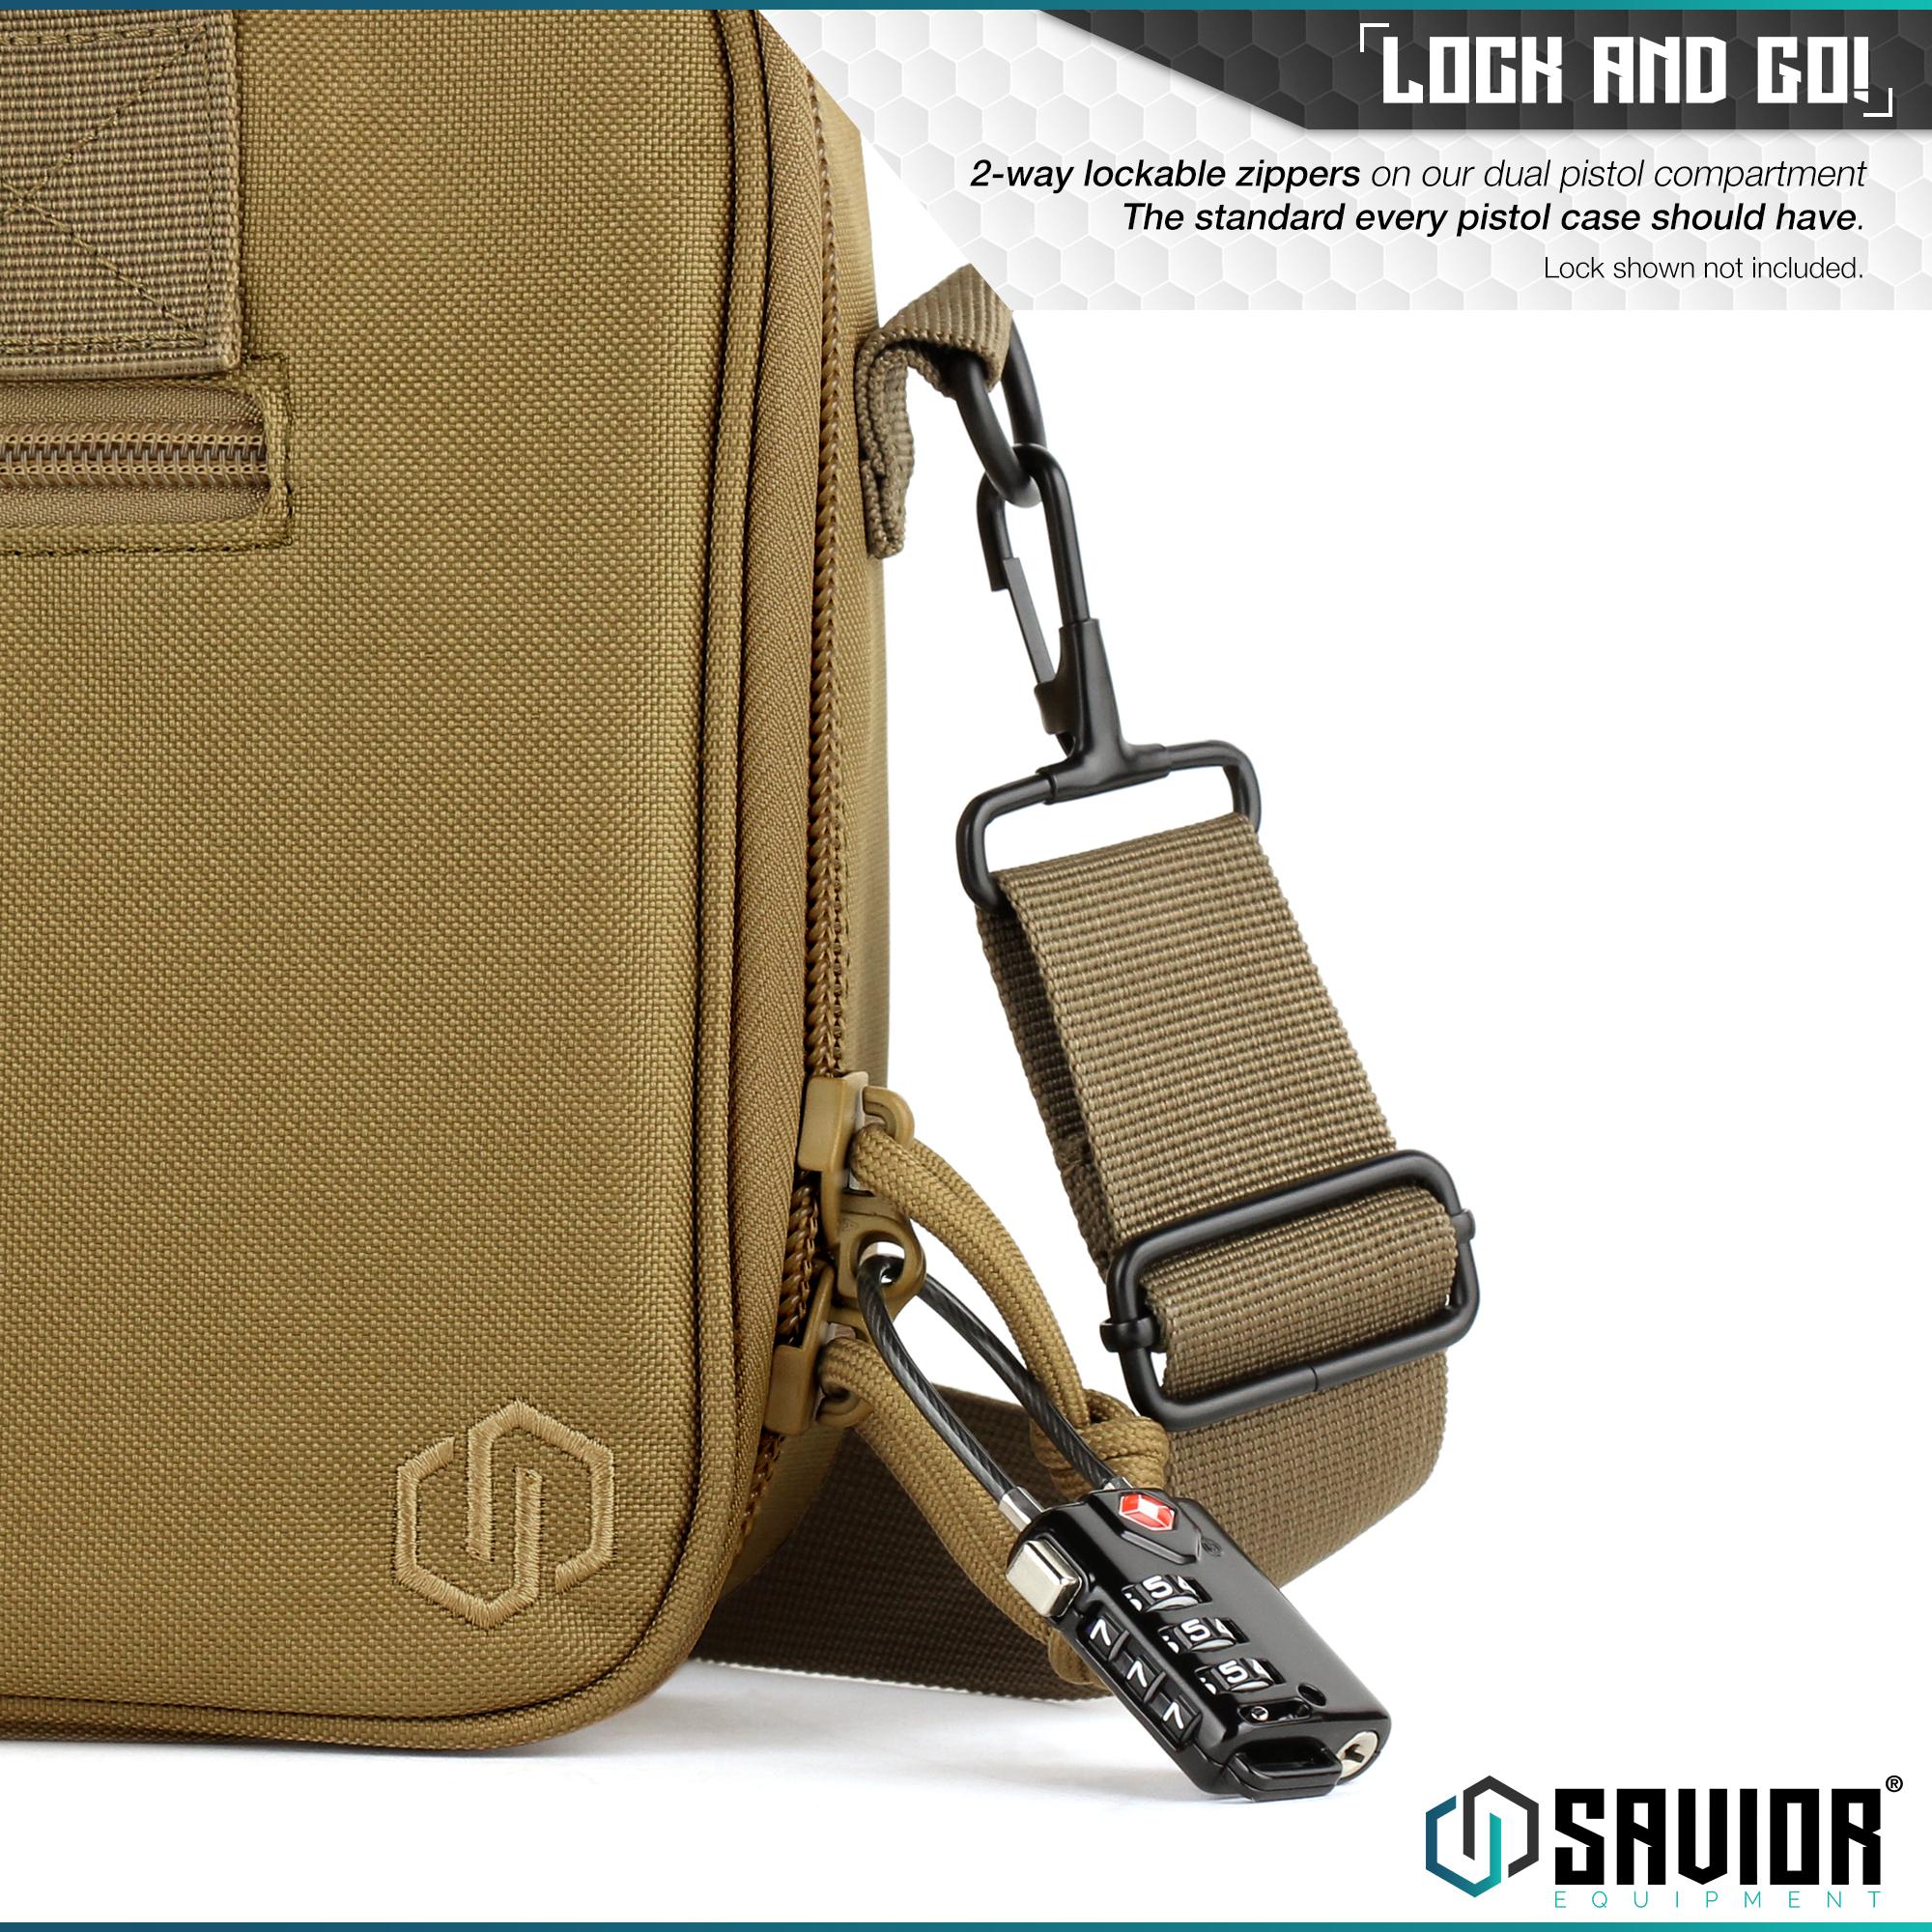 034-SAVIOR-034-Padded-Discreet-Double-Handgun-Bag-Pistol-Storage-Case-w-Mag-Pouch-Slot thumbnail 11